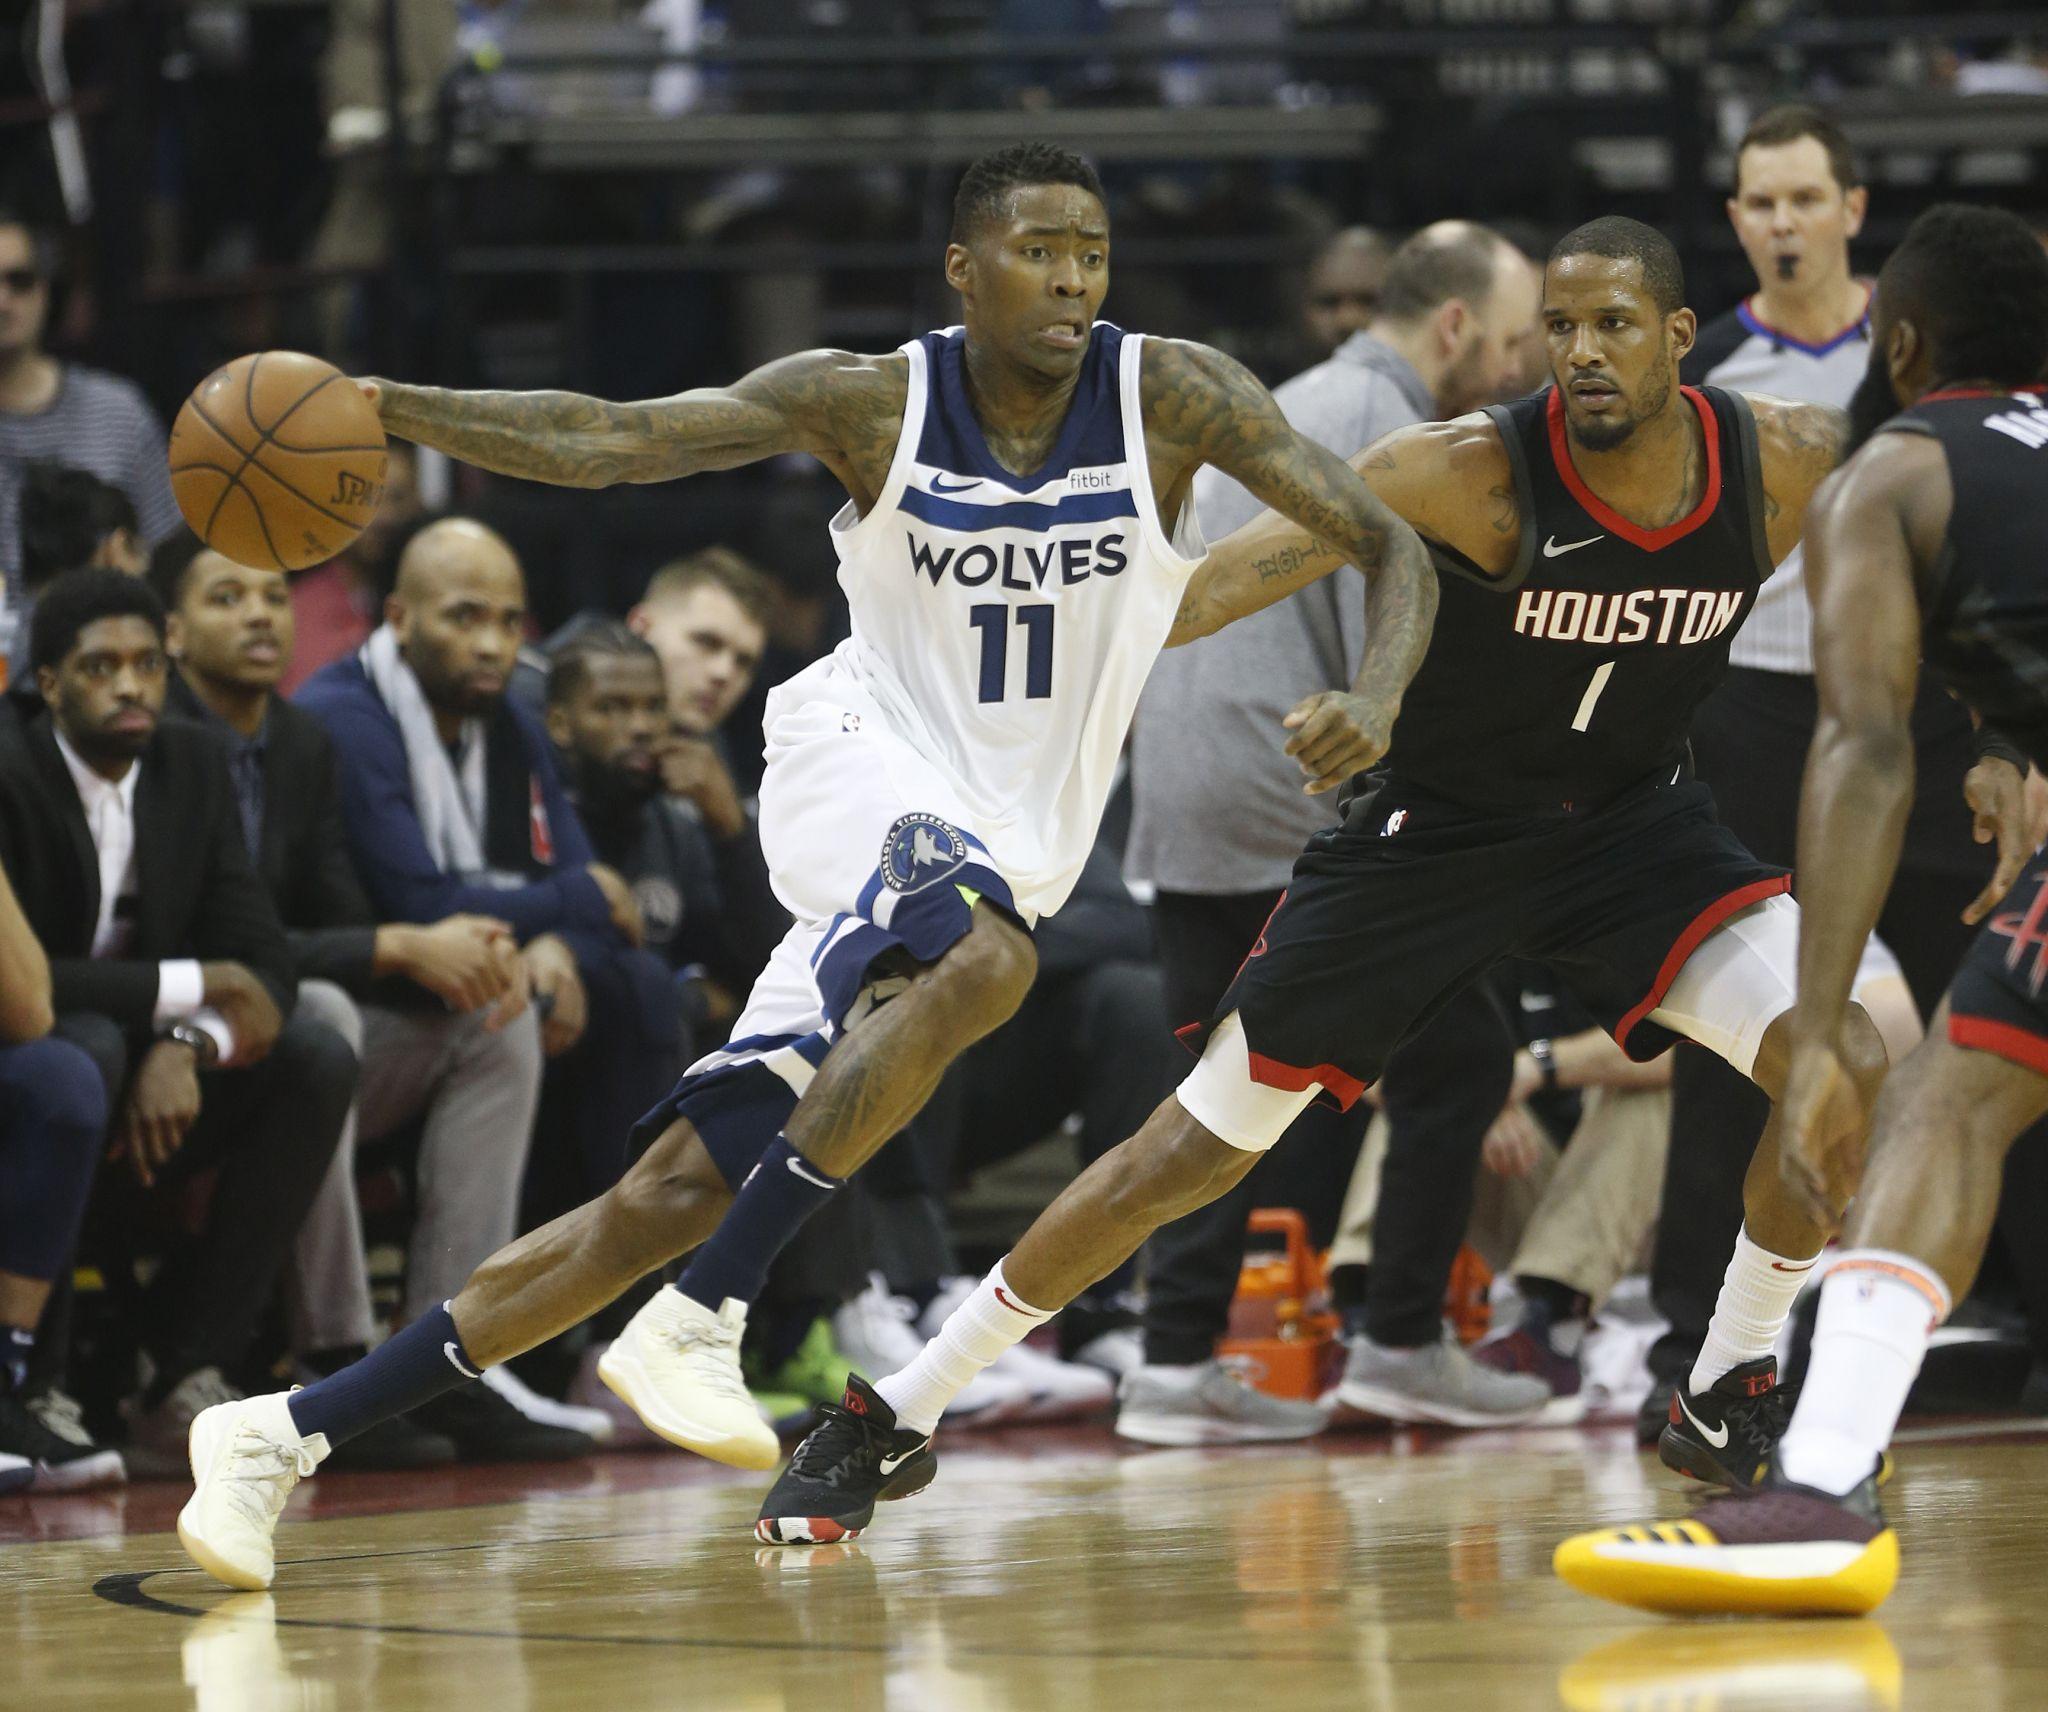 569956d5157e Ranking the NBA West after free agency  No. 10 Minnesota -  HoustonChronicle.com